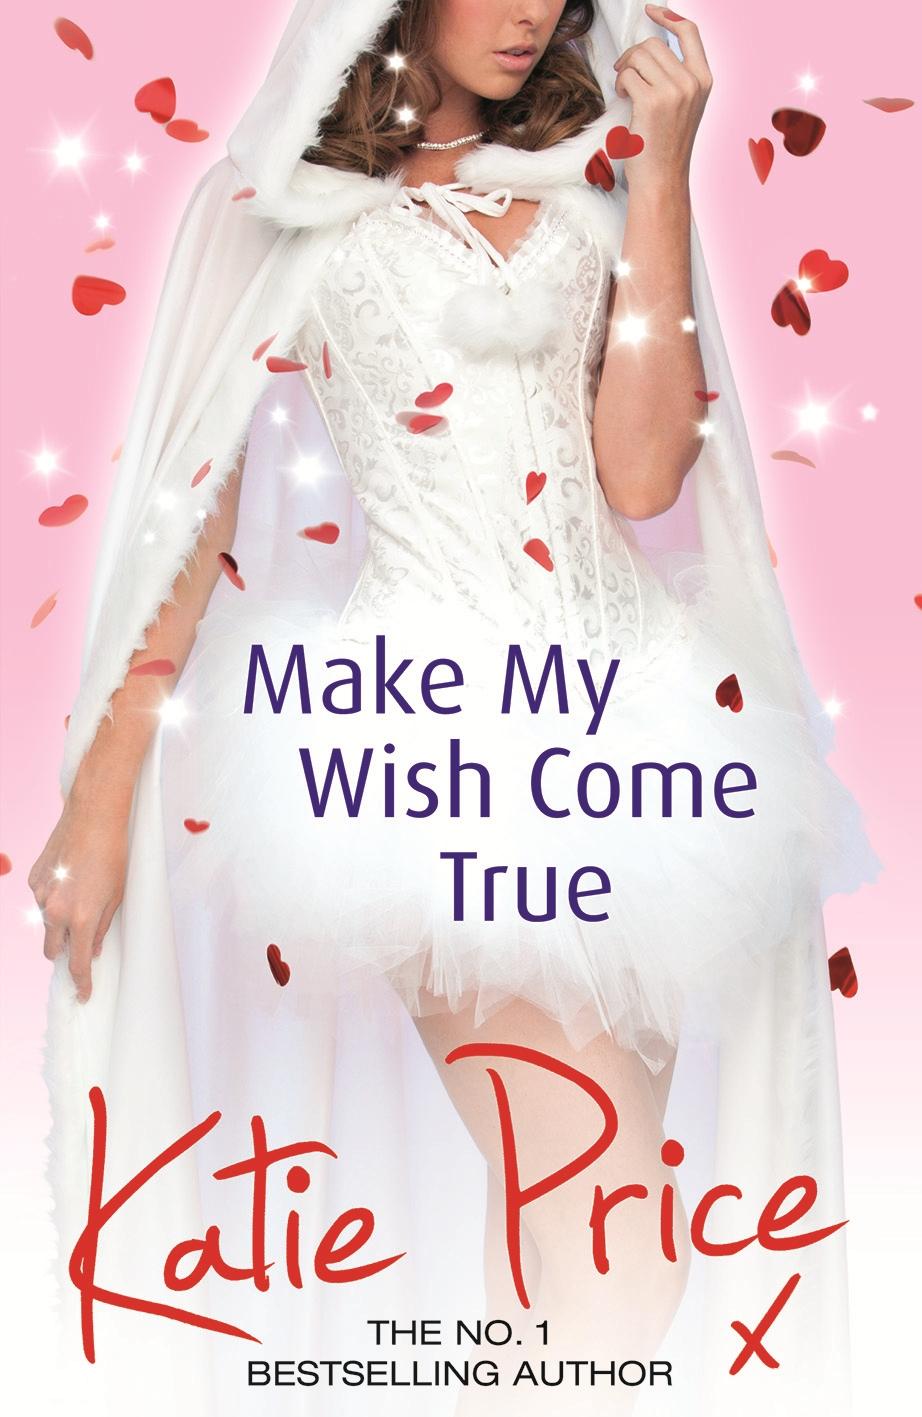 Make My Wish Come True by Katie Price - Penguin Books New